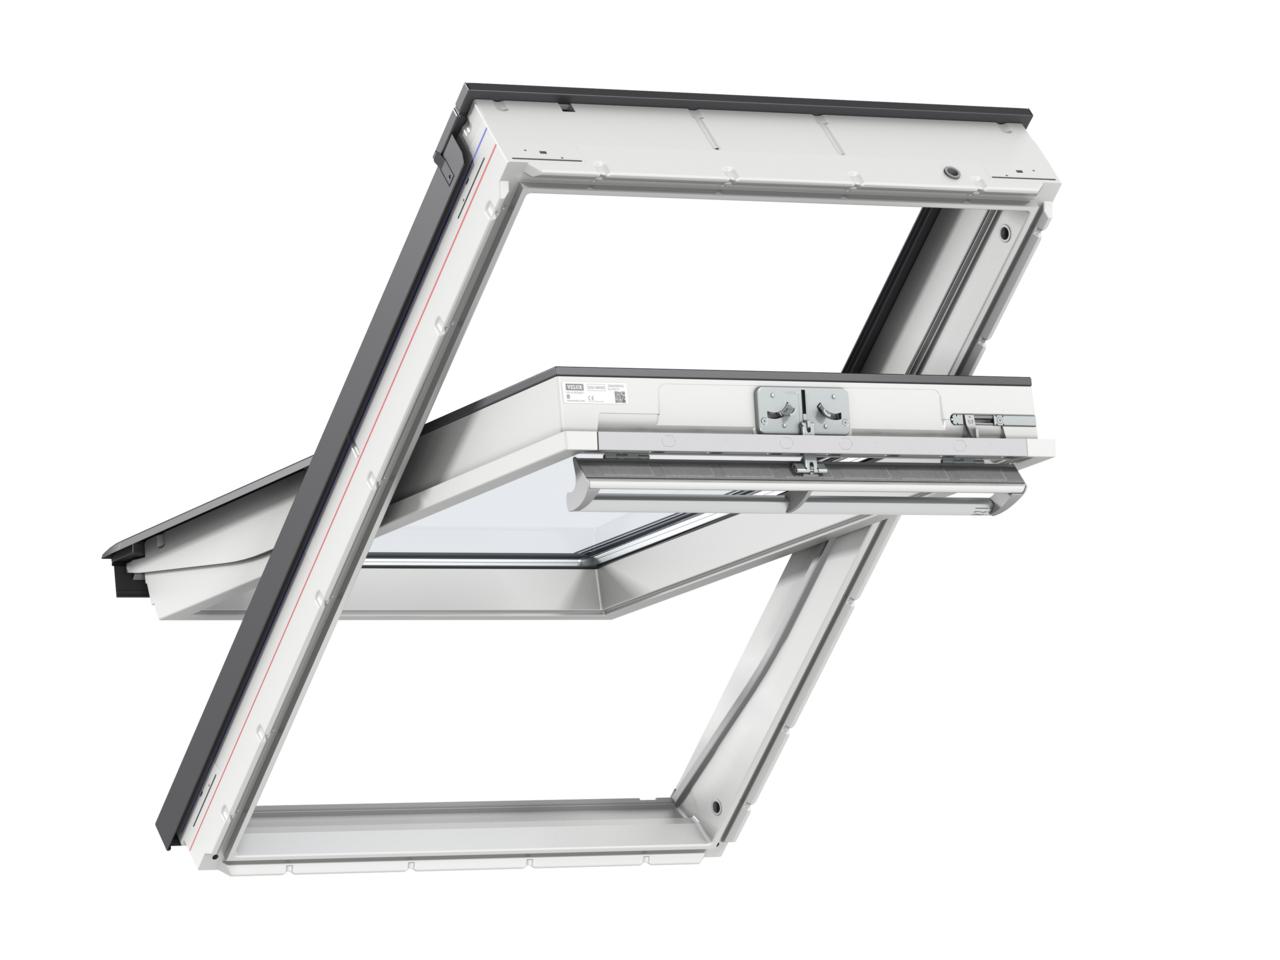 Velux GGU SK06 1140 x 1180mm Centre Pivot 34Pane Roof Window - White Polyurethane